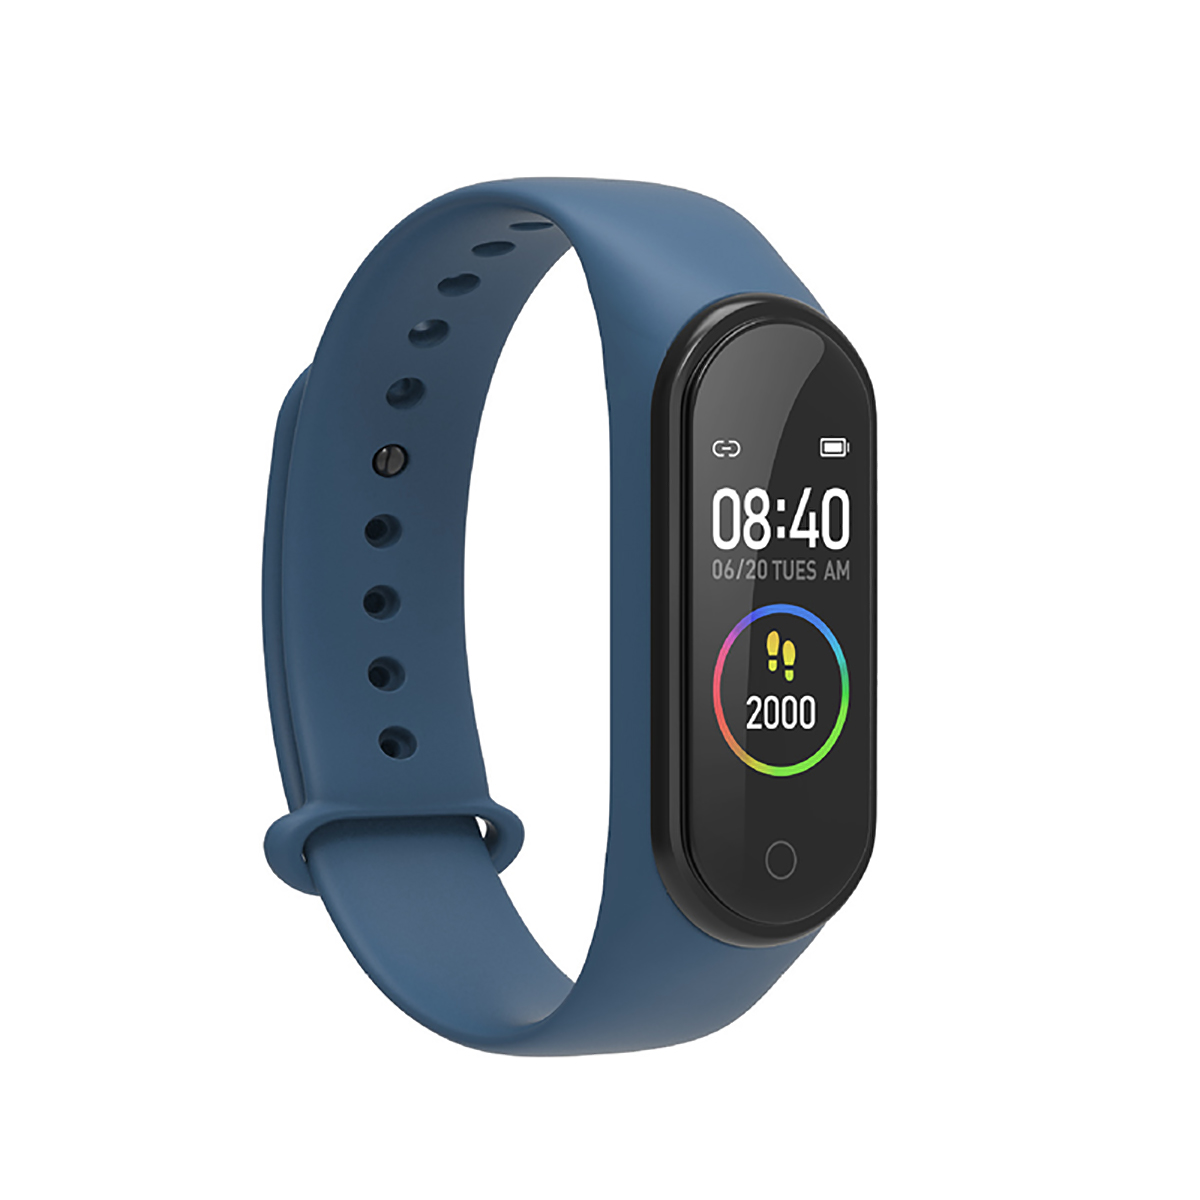 H4c0fc4ede5644977be2c05c8f417203fk New M4 Smart Band Fitness Tracker Smart Watch Sport Smart Bracelet Heart Rate Blood Pressure Smartband Monitor Health Wristband